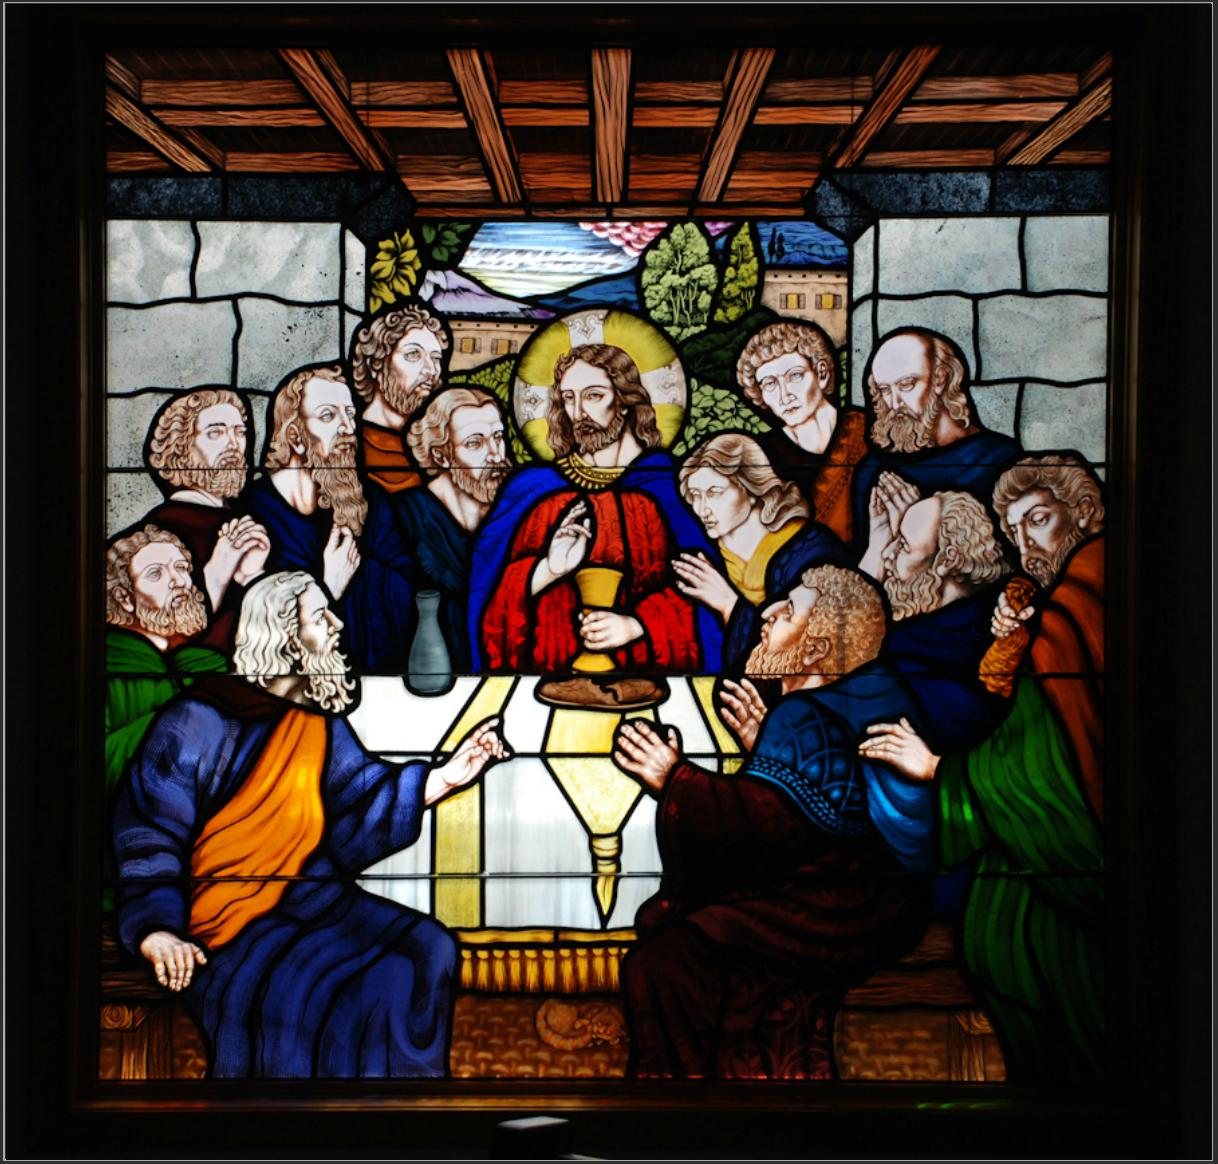 St. Theresa Catholic Church - Clearwater, NE